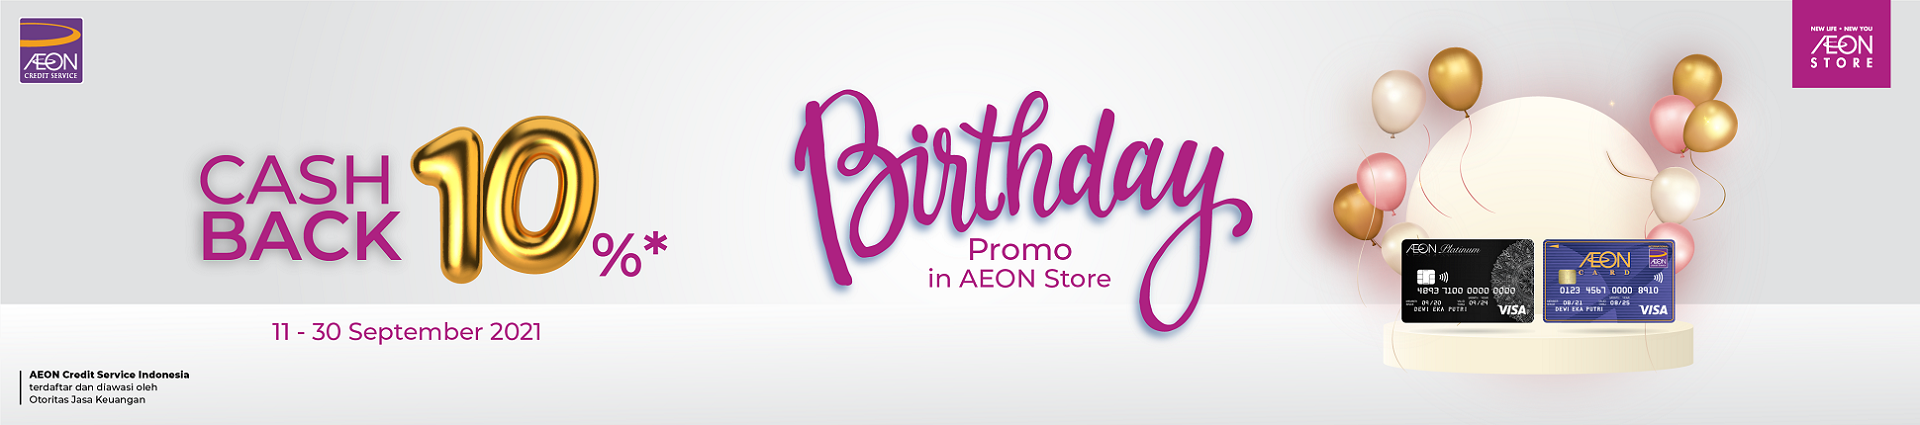 Birthday Cashback 10% di AEON Store